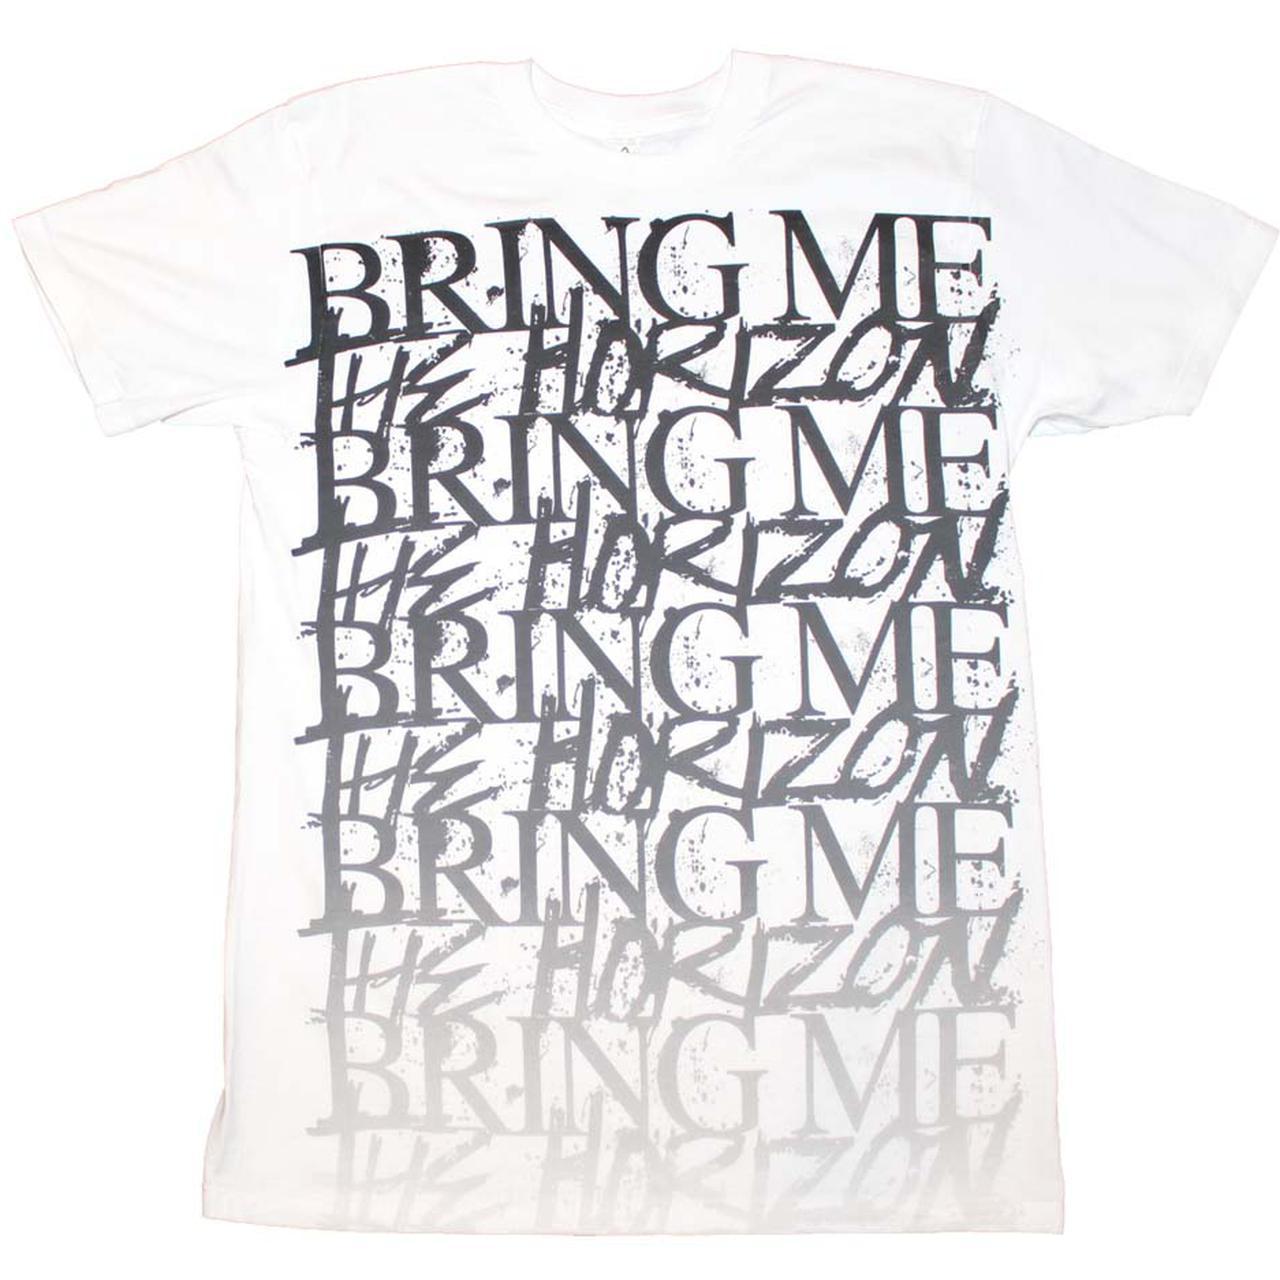 Me the horizon symbol shirt bring me the horizon symbol shirt buycottarizona